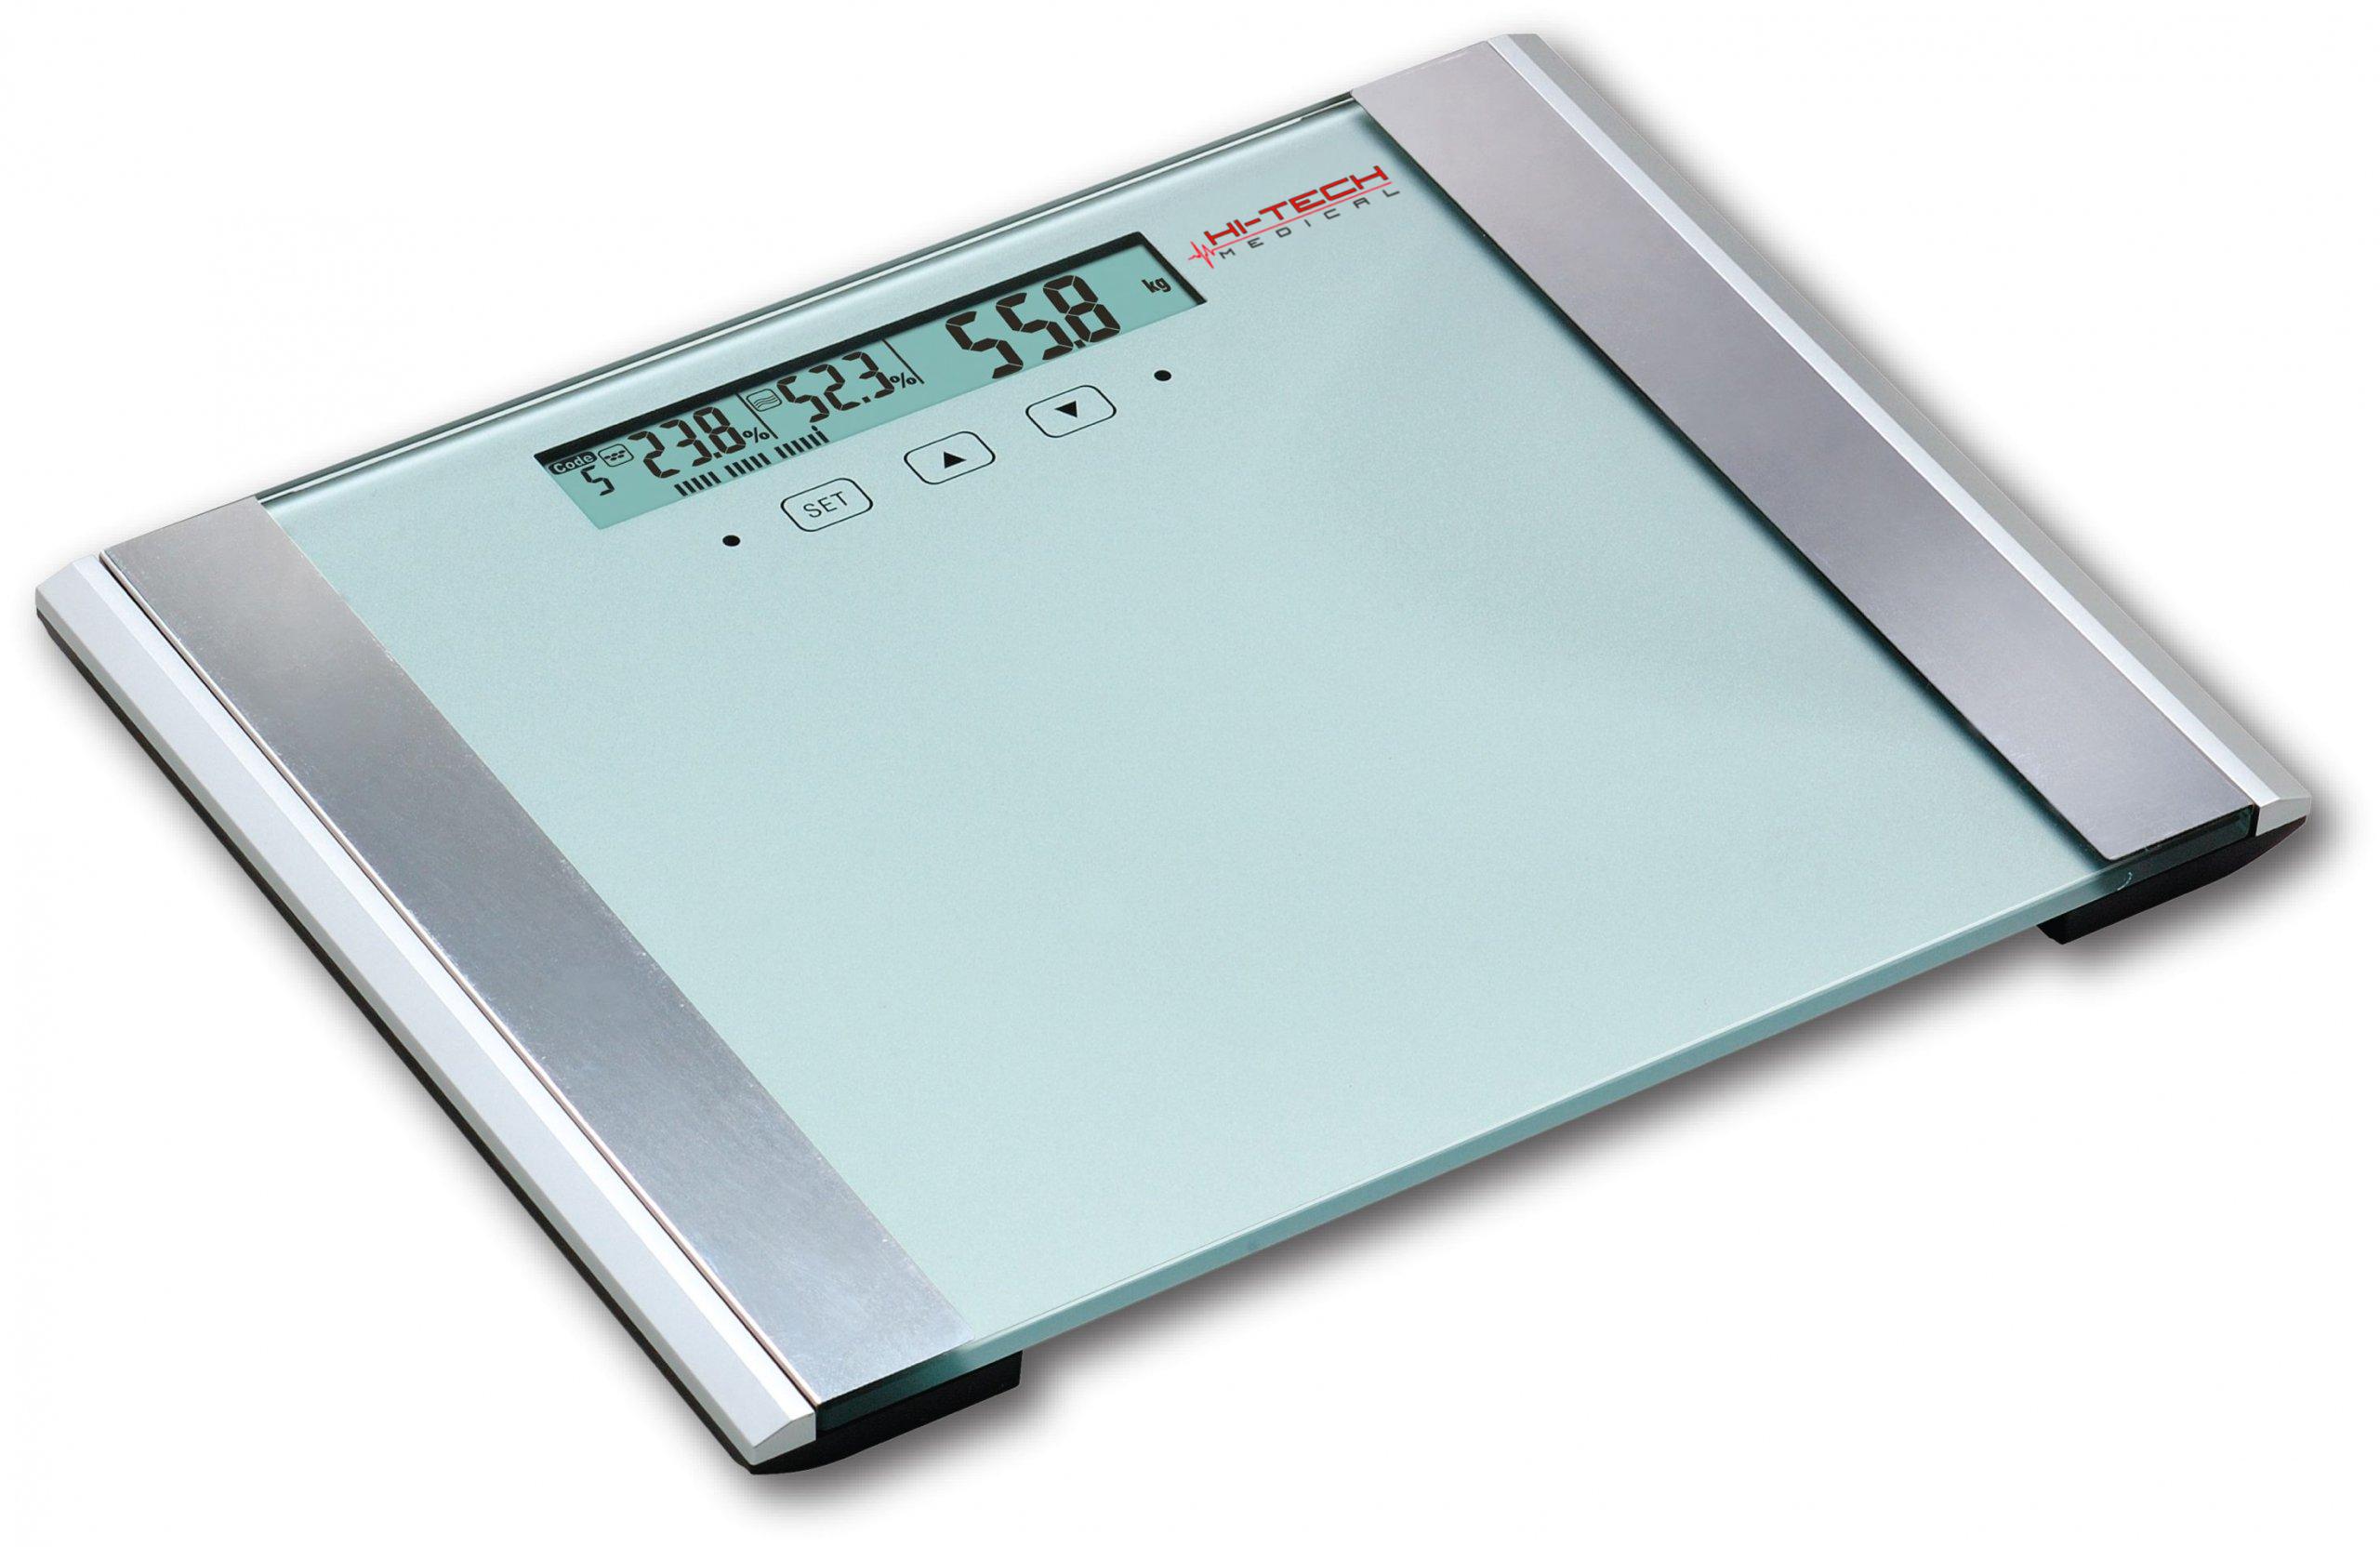 Analytická elektronická hmotnosť 7W1 HI-TECH KT-912